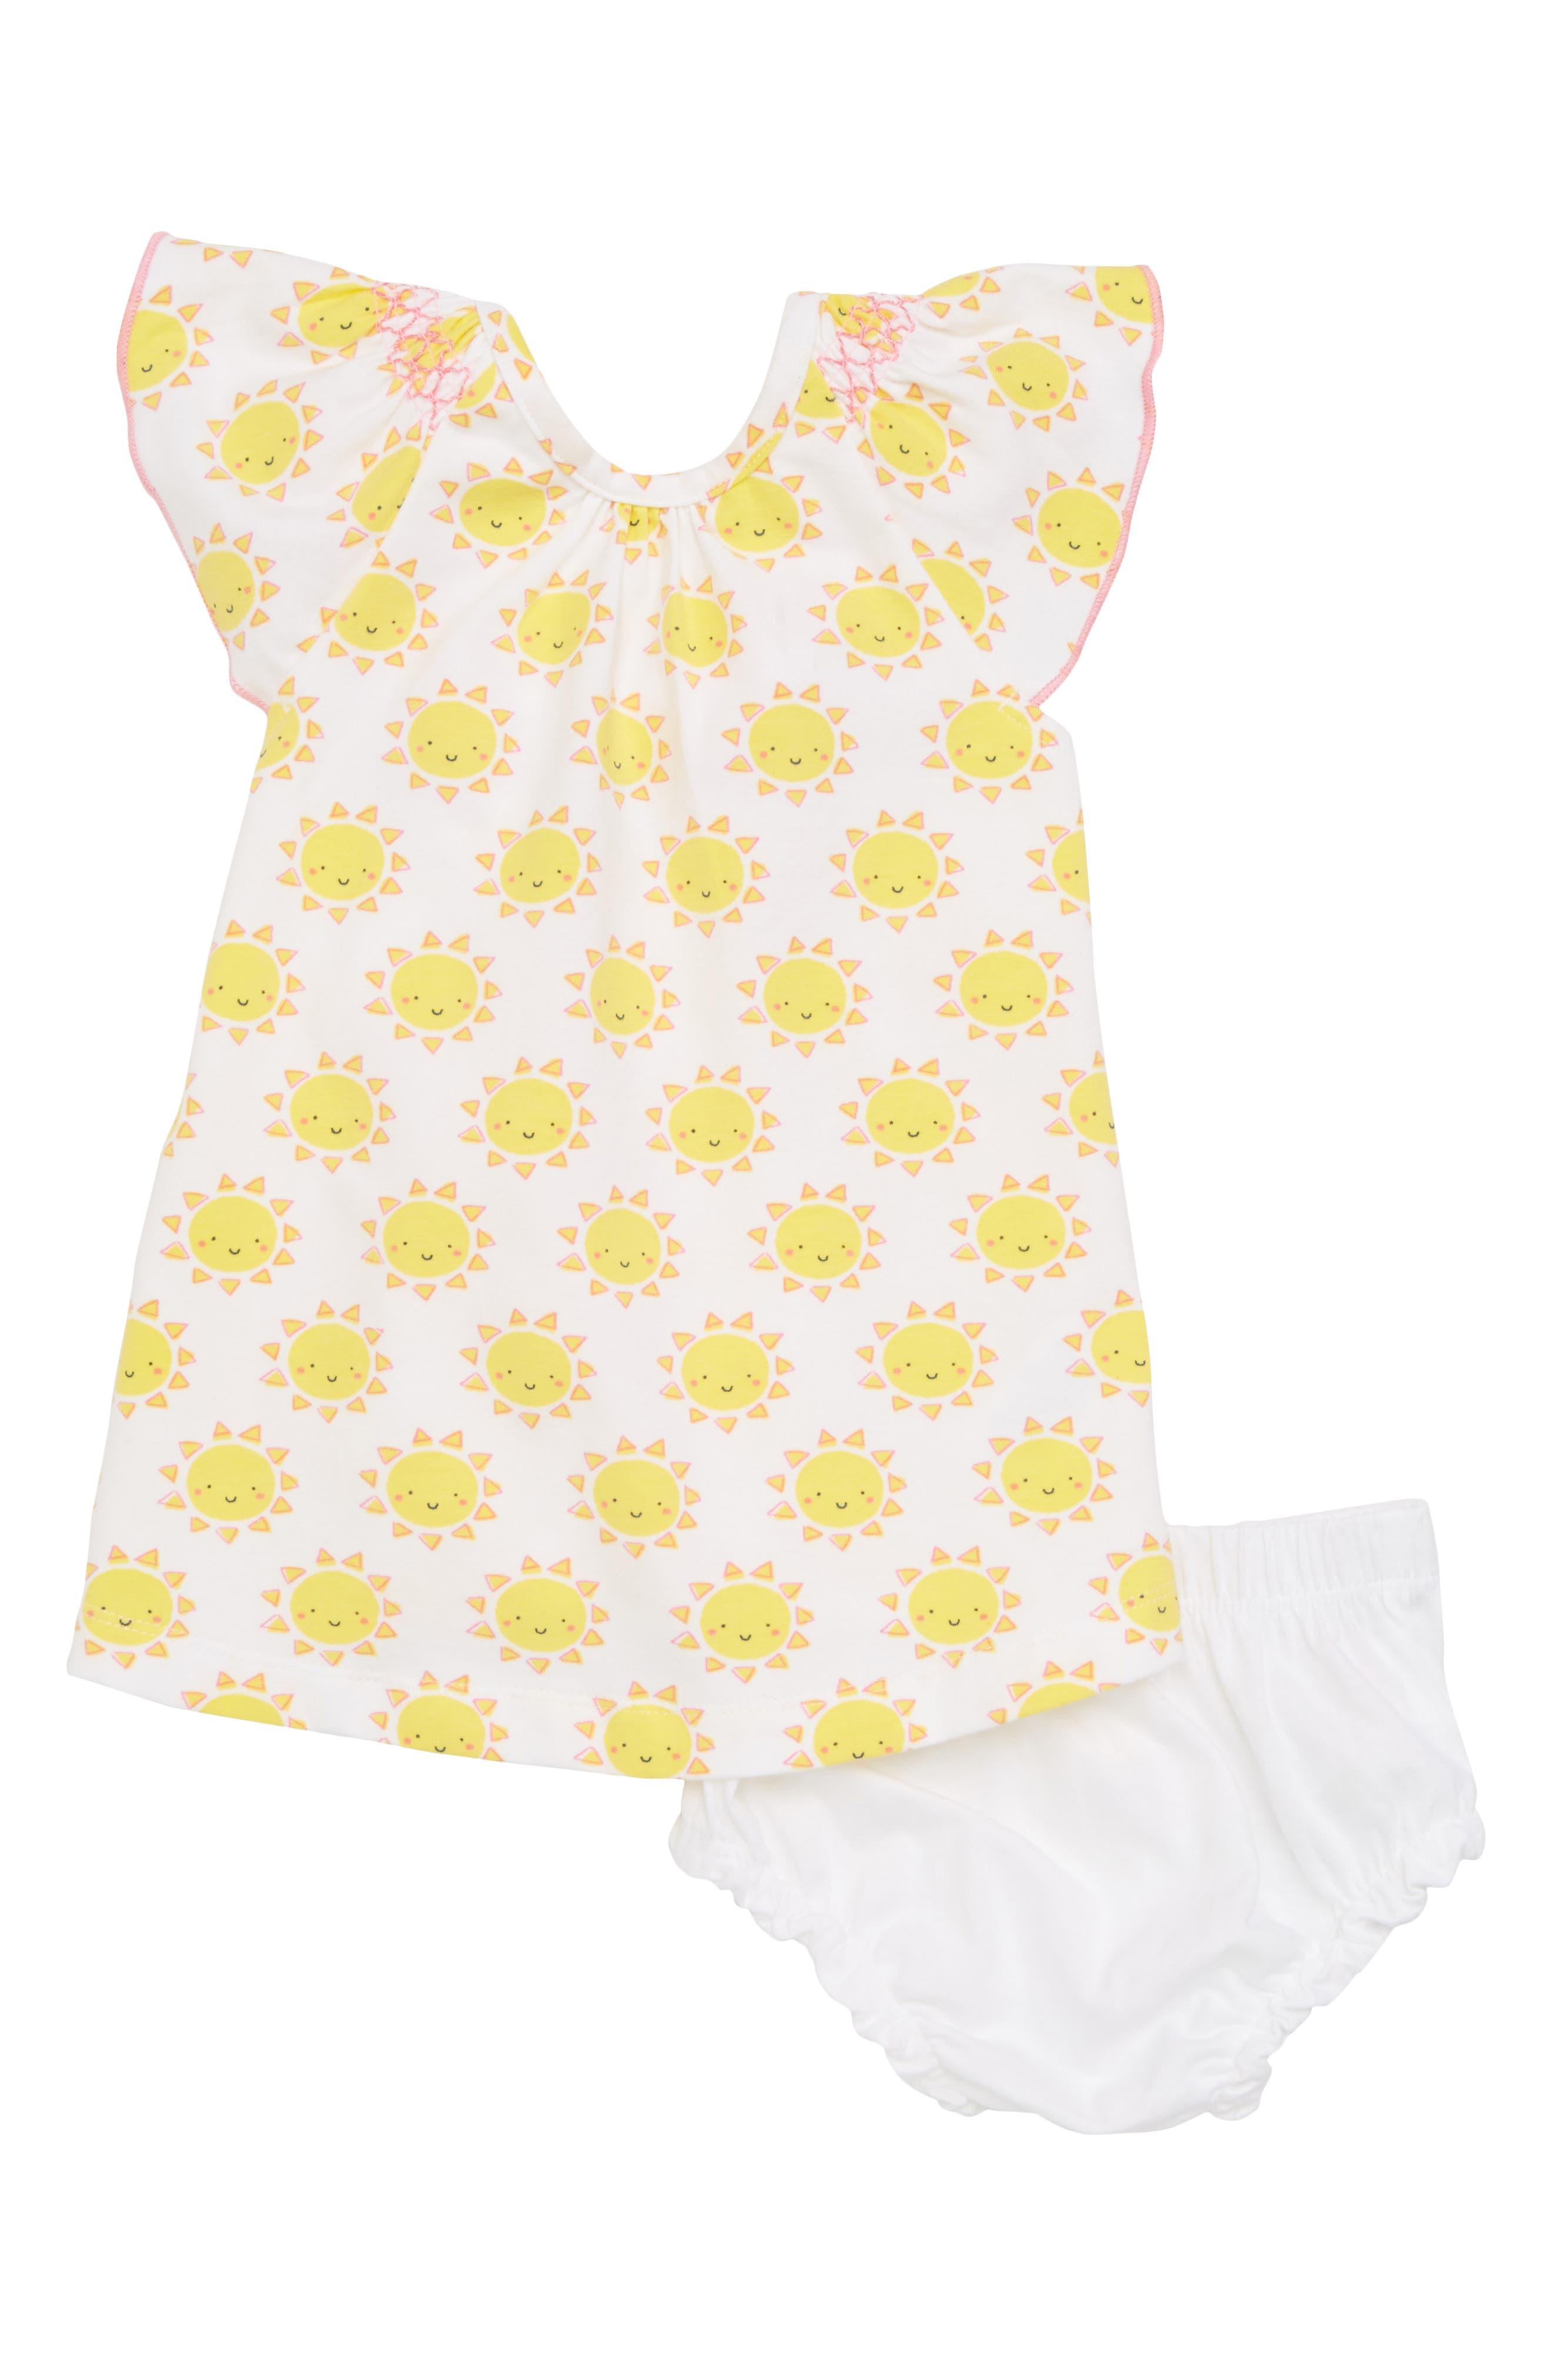 Merry Sunshine Dress,                         Main,                         color, Merry Sunshine